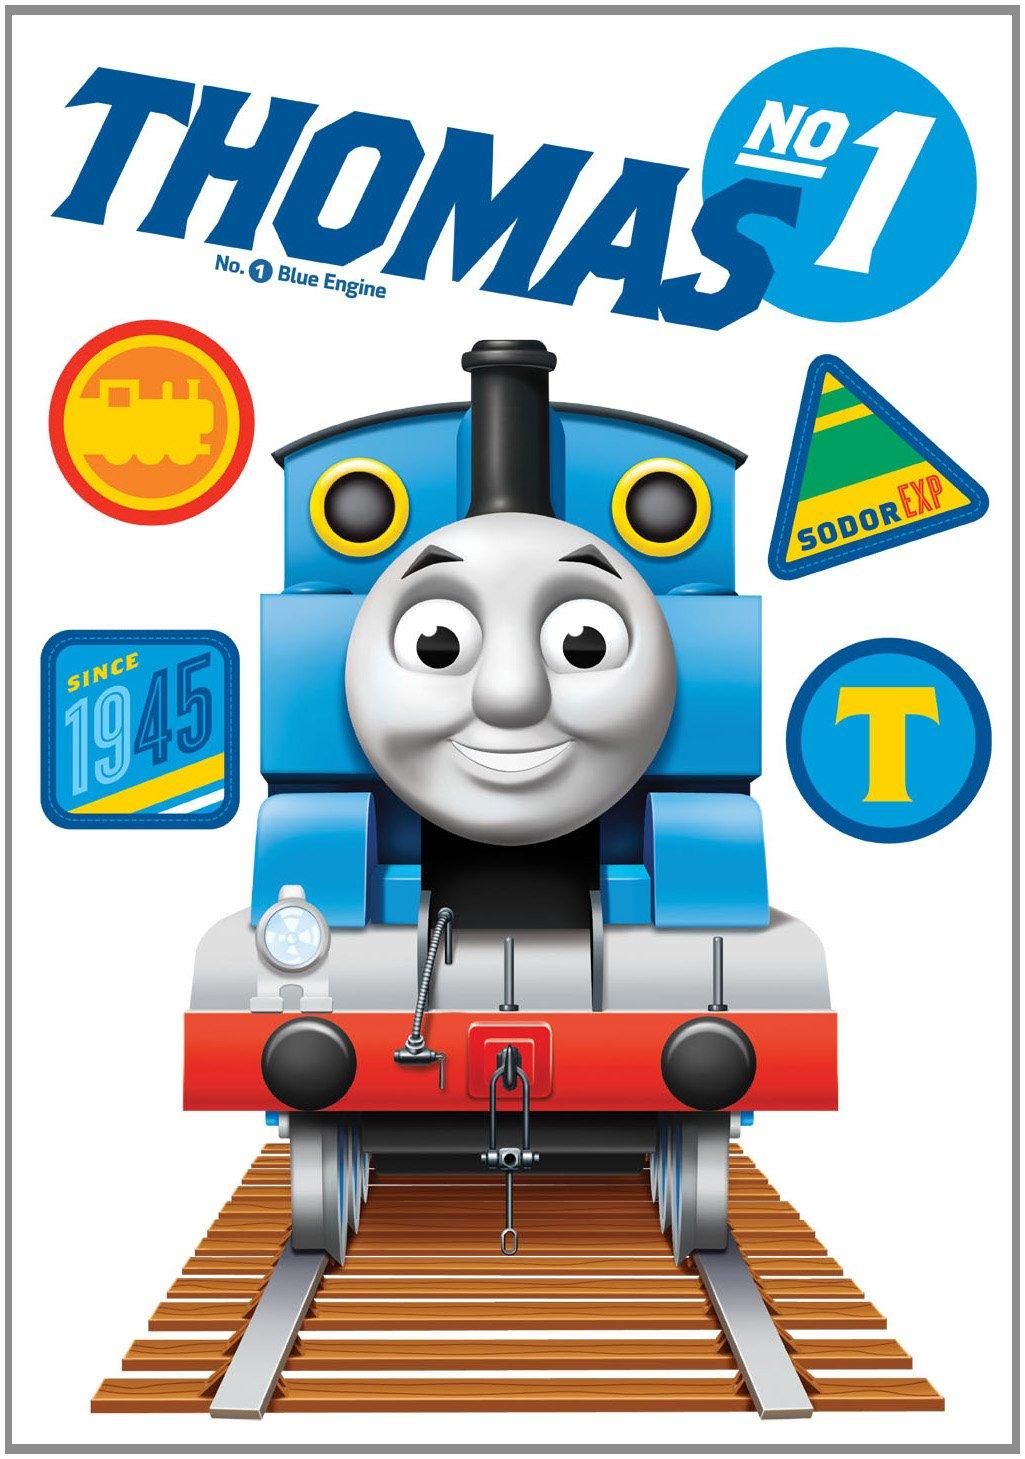 Thomas the tank engine wallpaper border - Decofun Thomas The Tank Engine Giant Wall Sticker Amazon Co Uk Kitchen Home